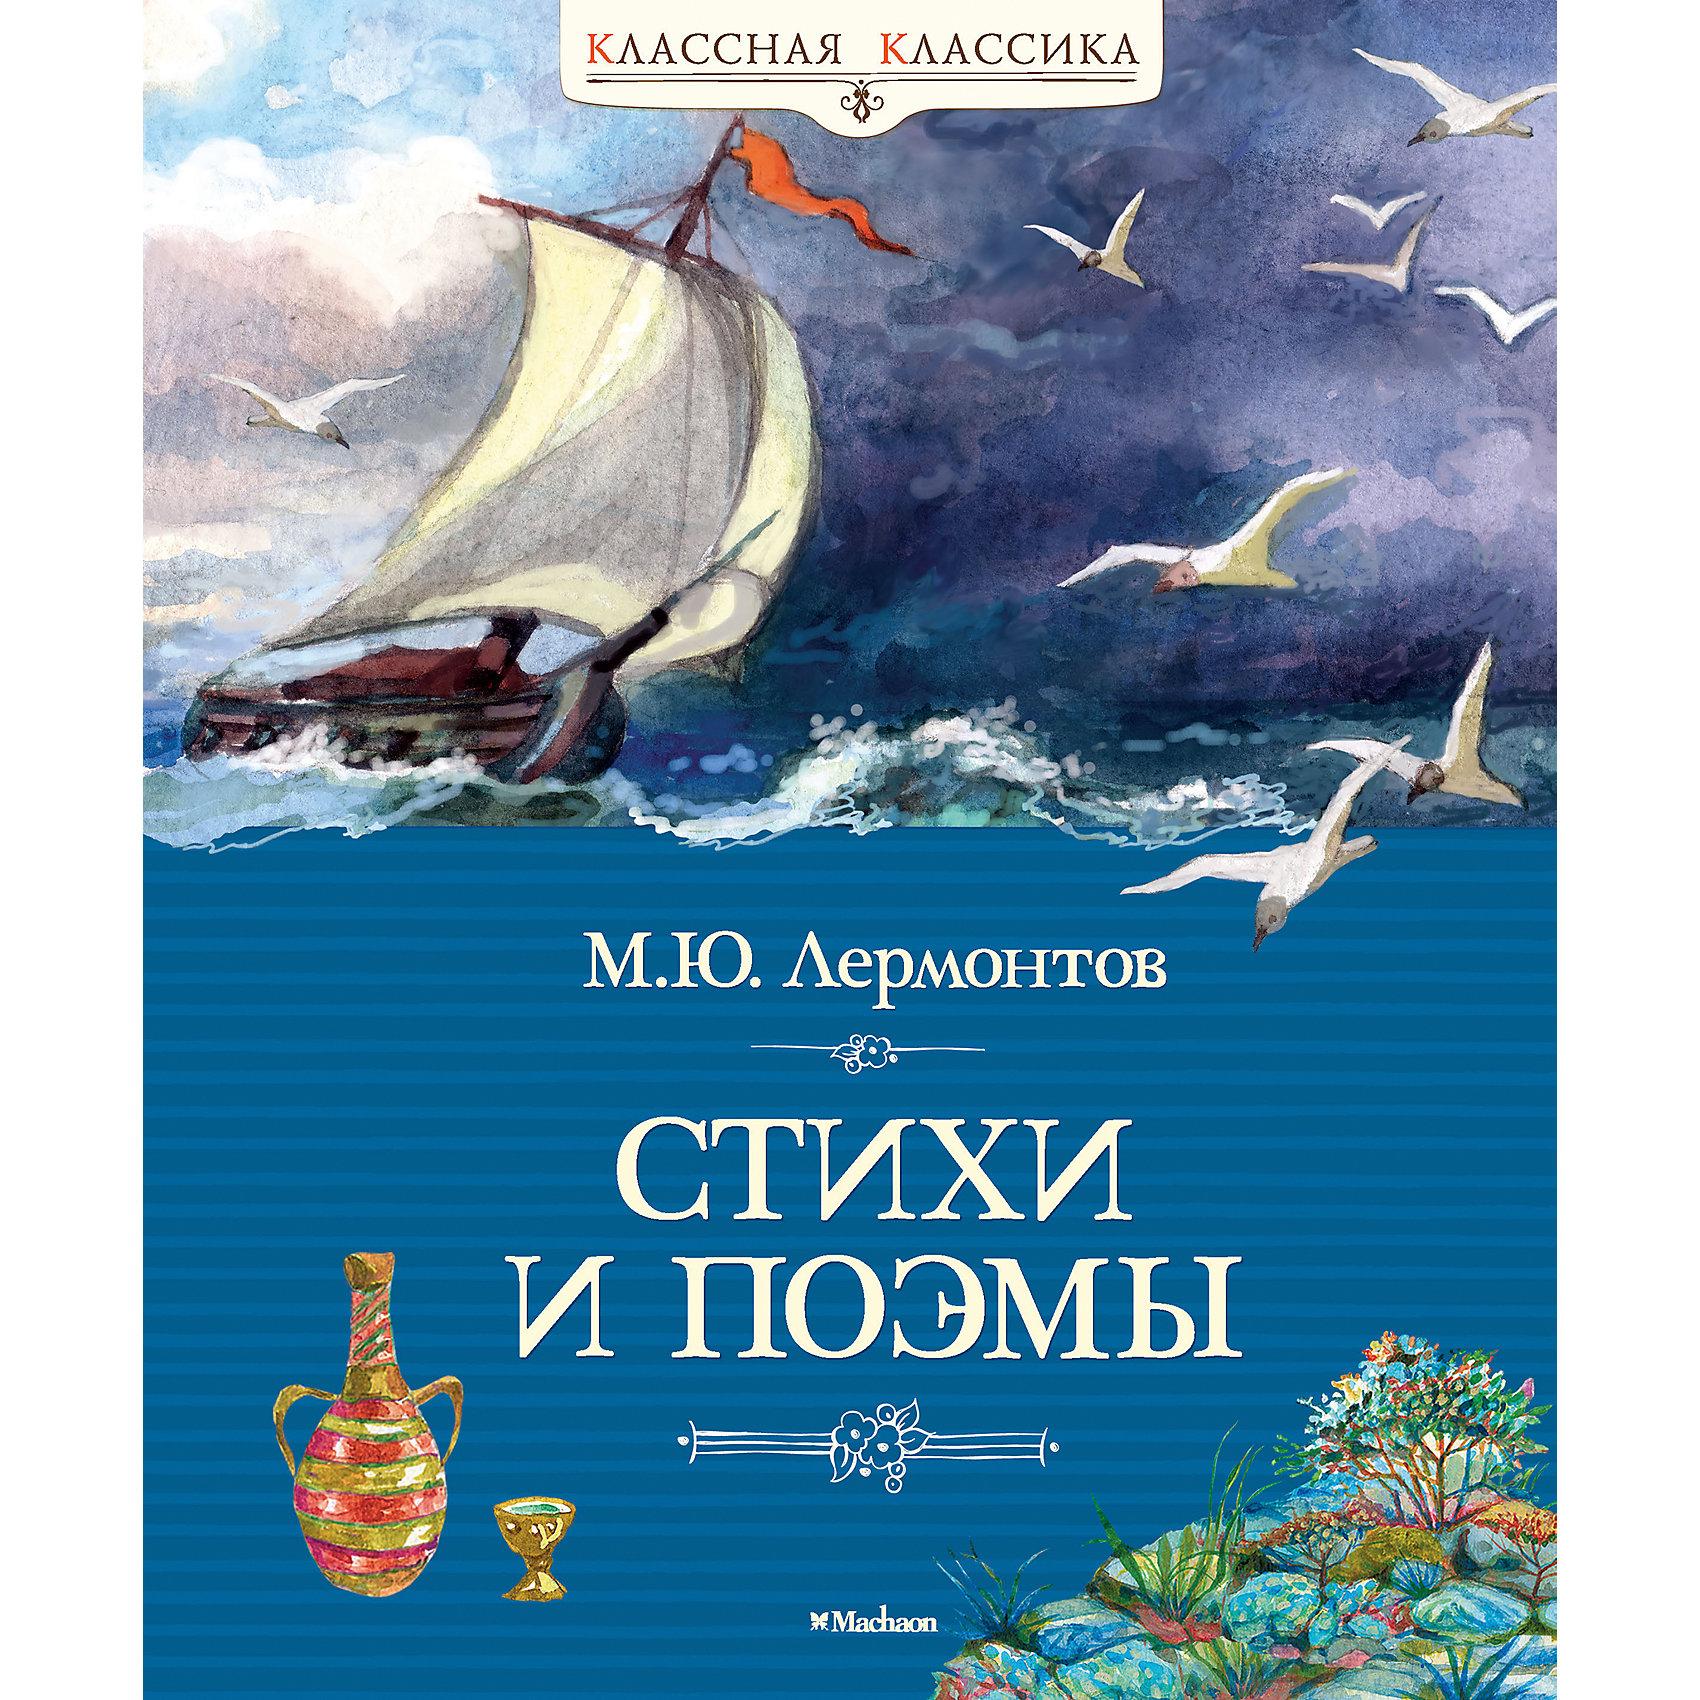 Махаон Стихи и поэмы, М.Ю. Лермонтов